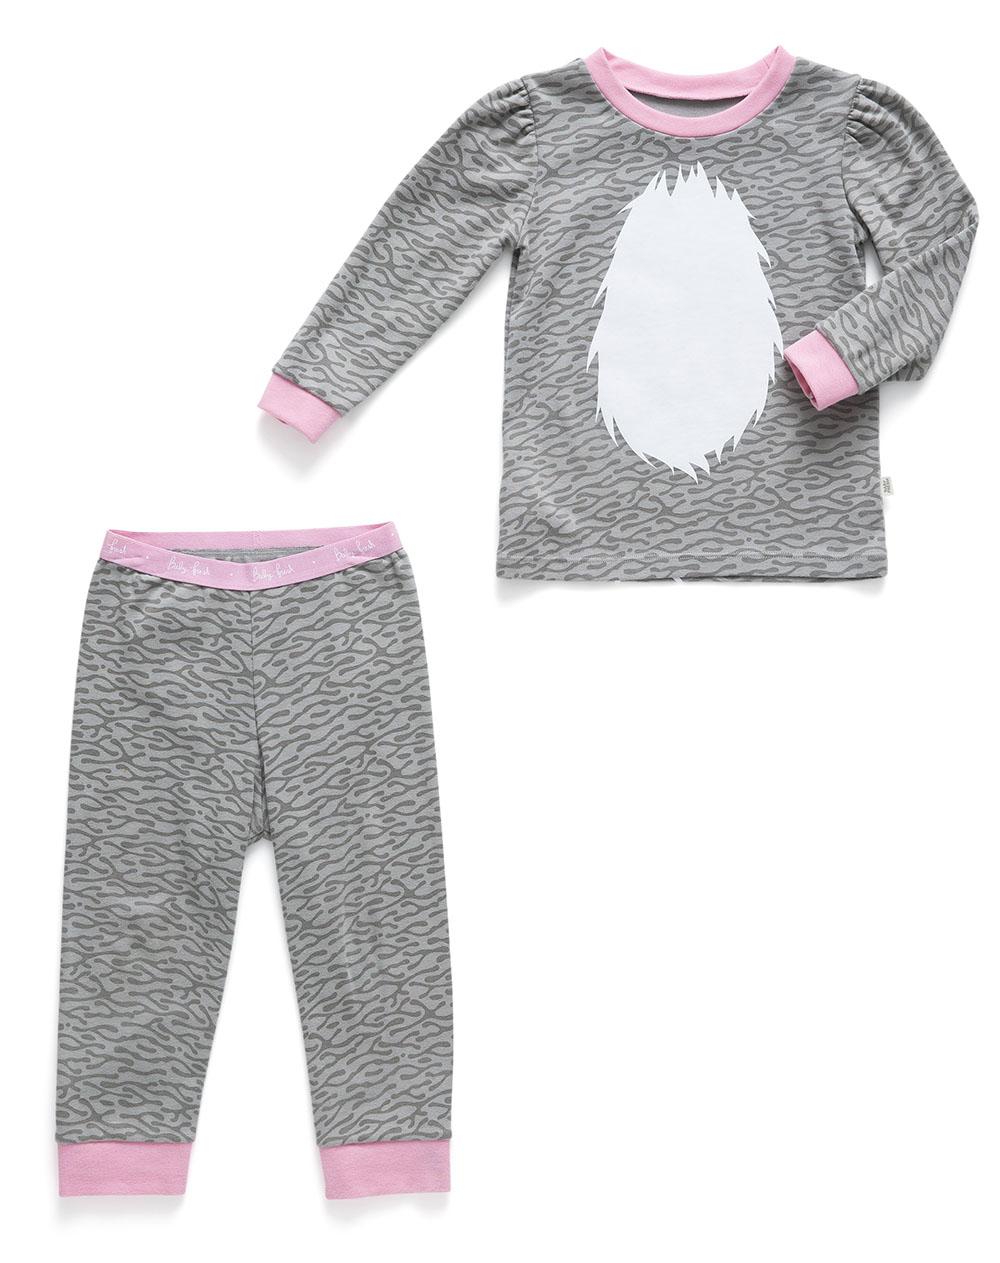 f46b01a70d Conjunto de Pijama para Bebé Niña Cat Magin Gris Baby Fresh